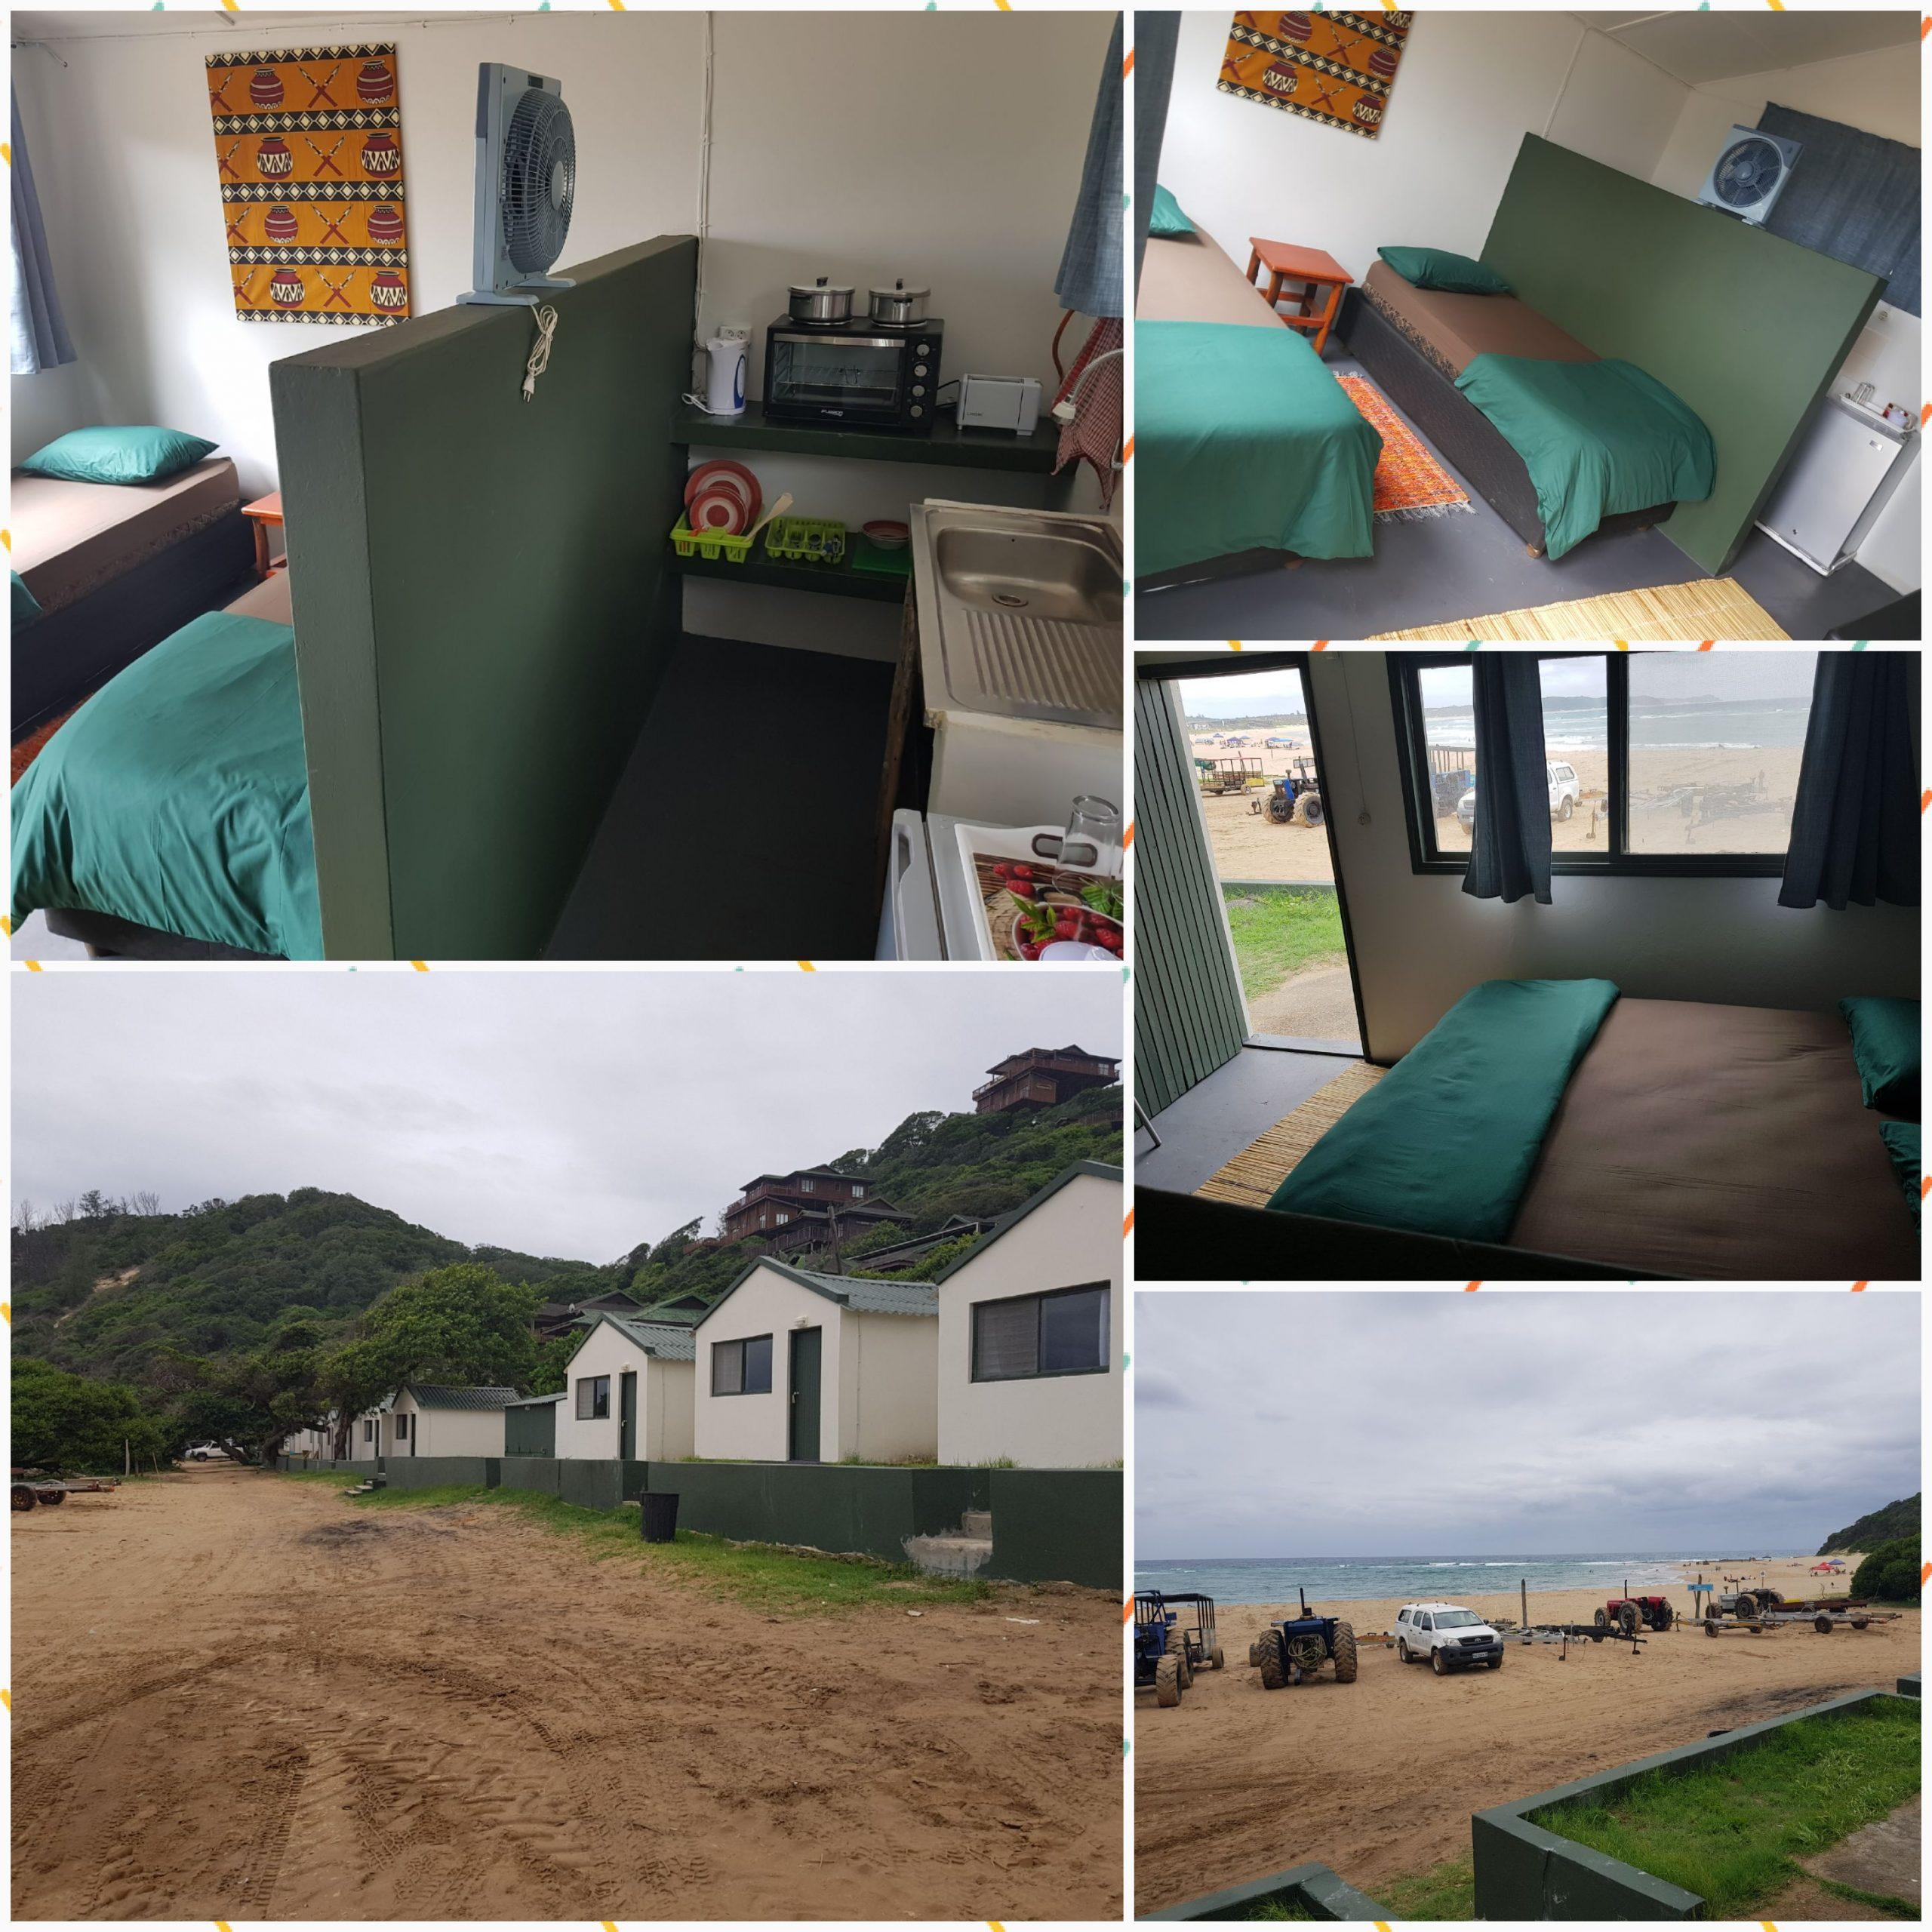 Kaya Beach Camps 2 sleeper units